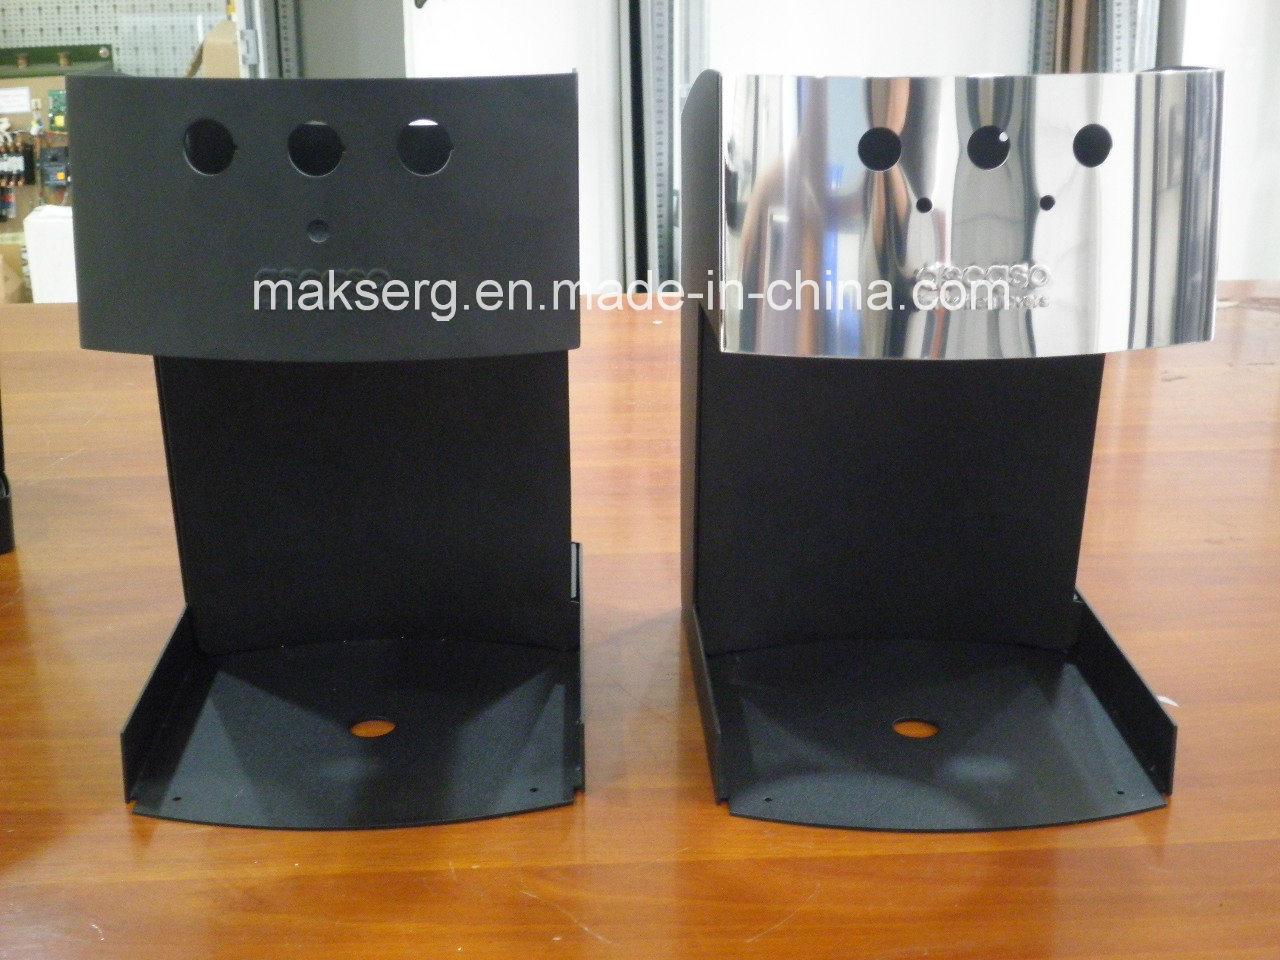 Sheet Metal Fabrication for Coffee Machine Enclosure